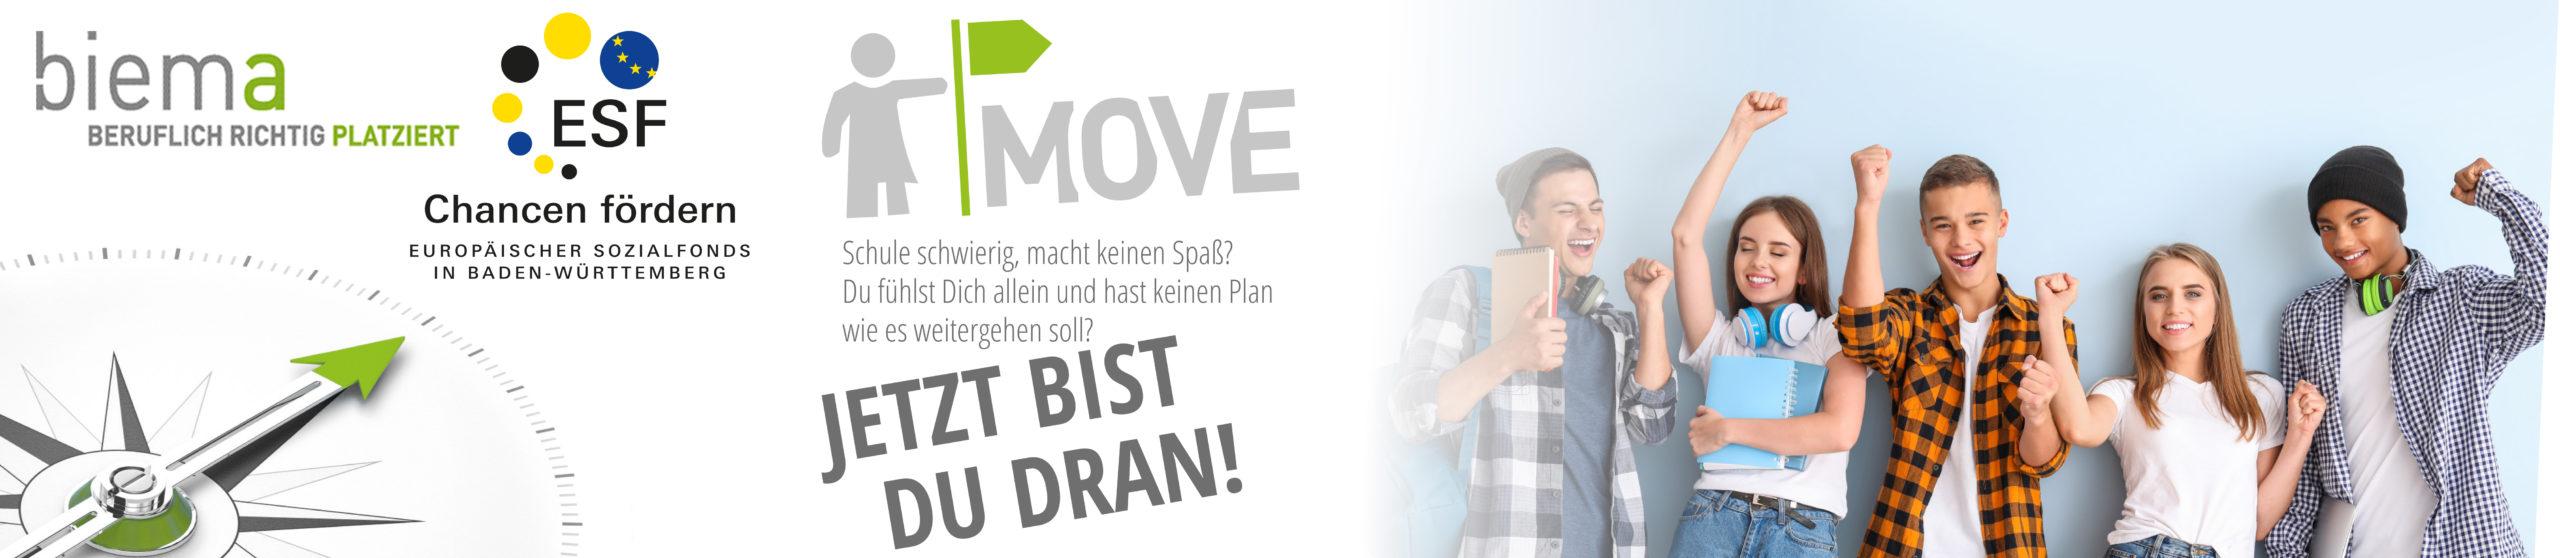 MOVE_Beitrag_Bild